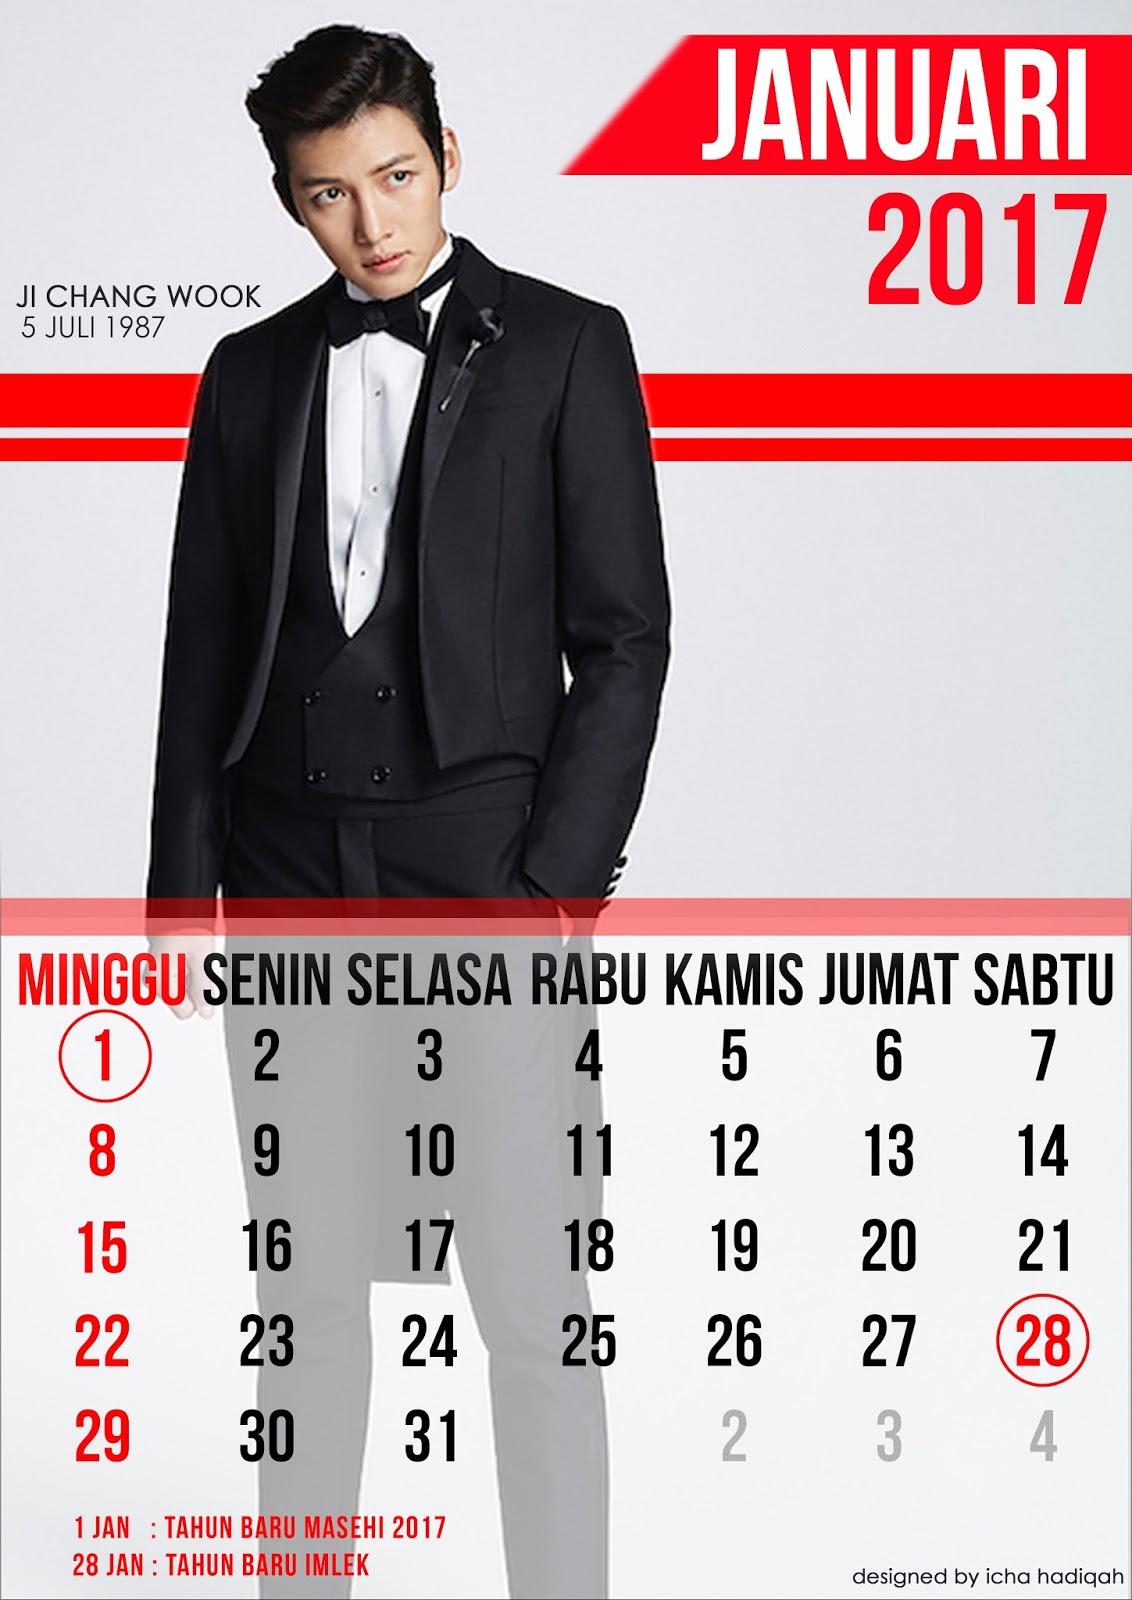 WELCOME 2017, WELCOME JANUARY ! | SpicySugar